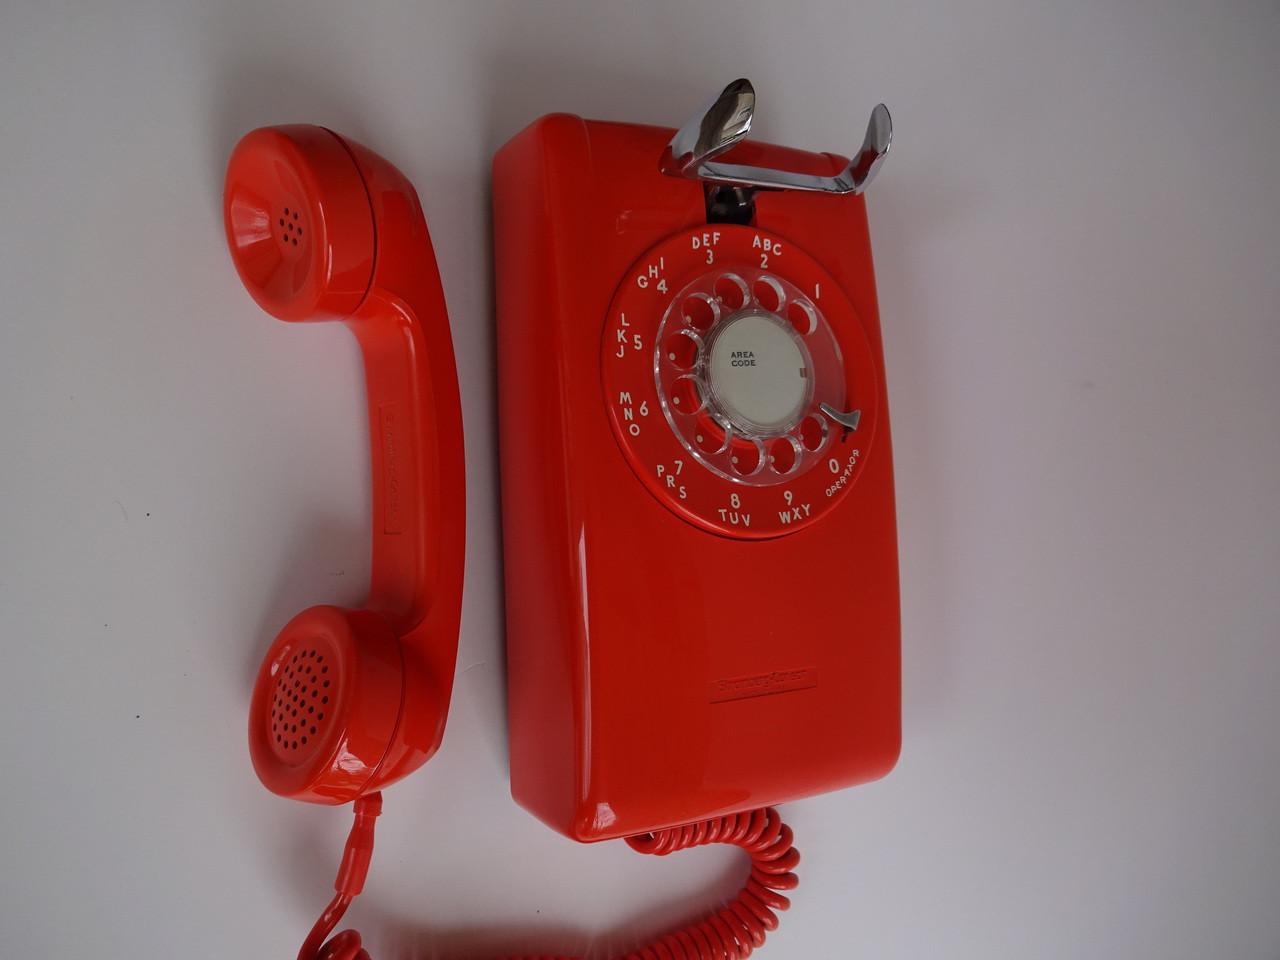 Stromberg Carlson Rotary dial wall phone Orange 500 - Old